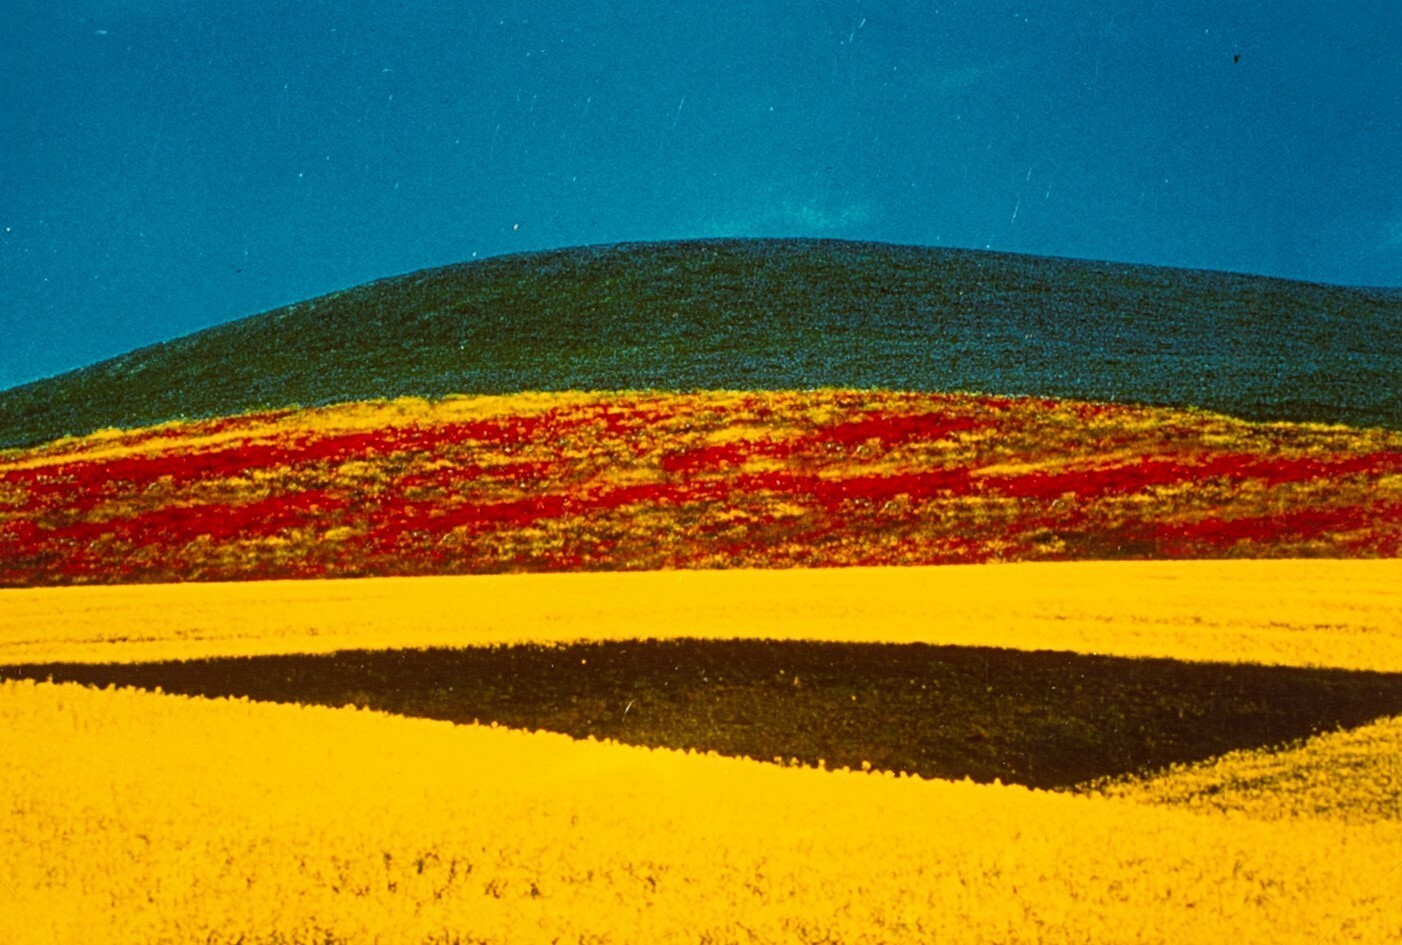 Пейзаж, 1995. Фотограф Франко Фонтана